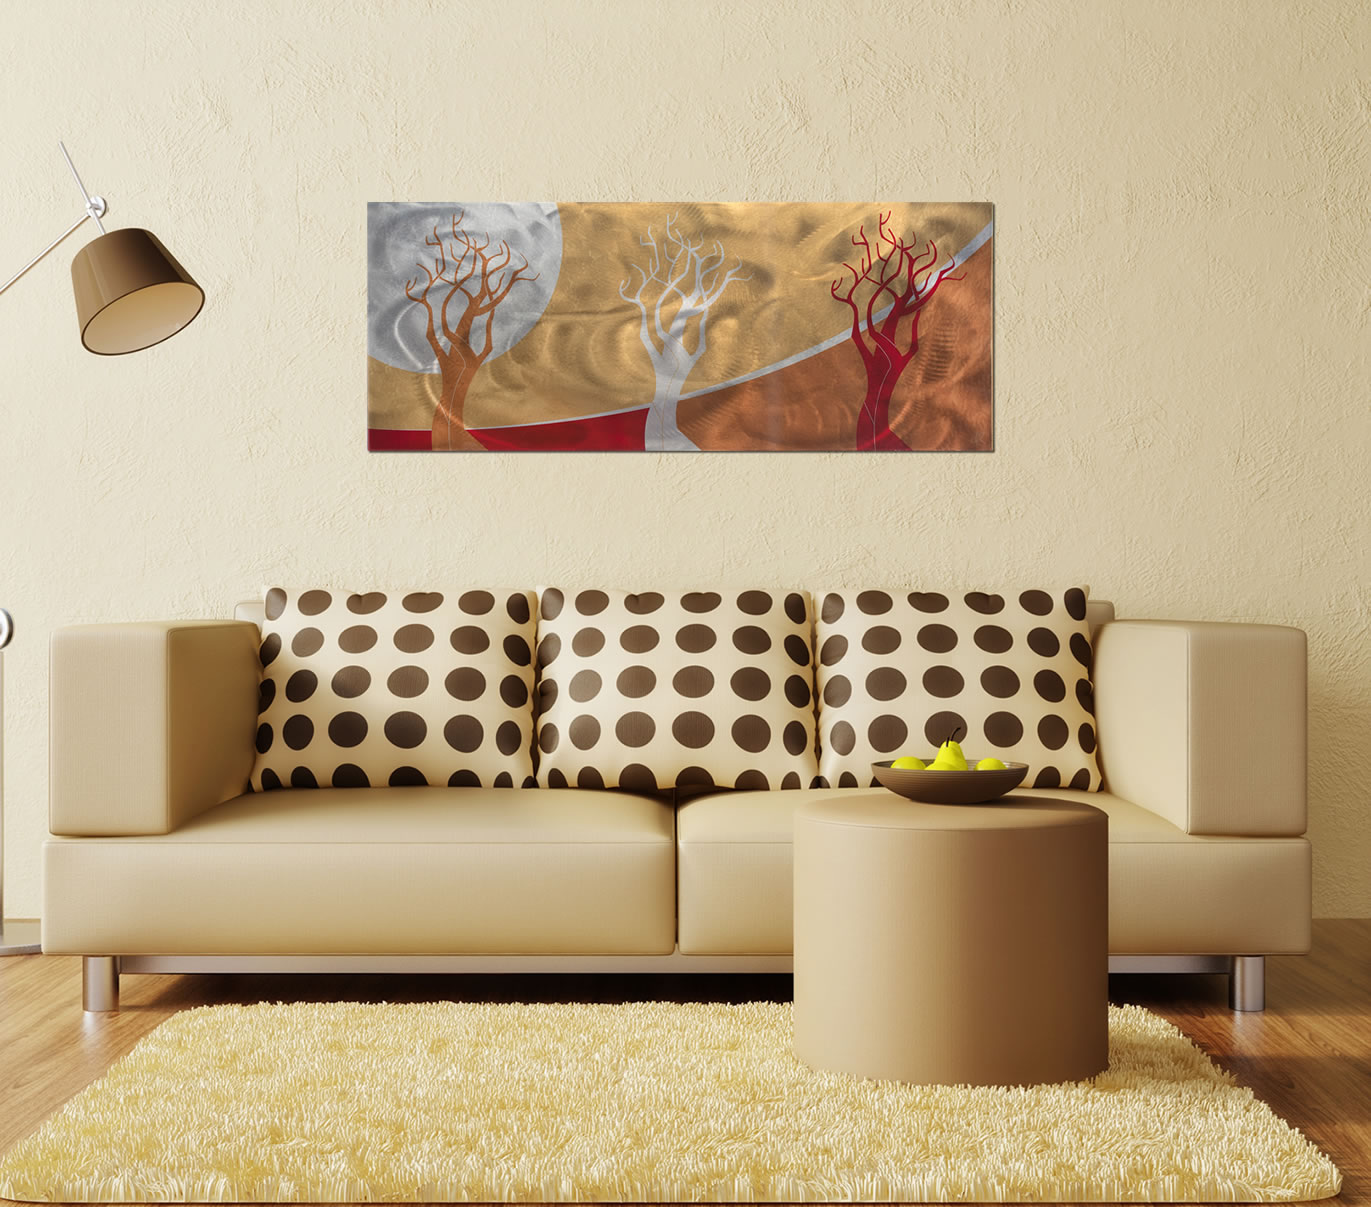 Golden Seasons - Sunset Landscape Abstract Art - Lifestyle Image